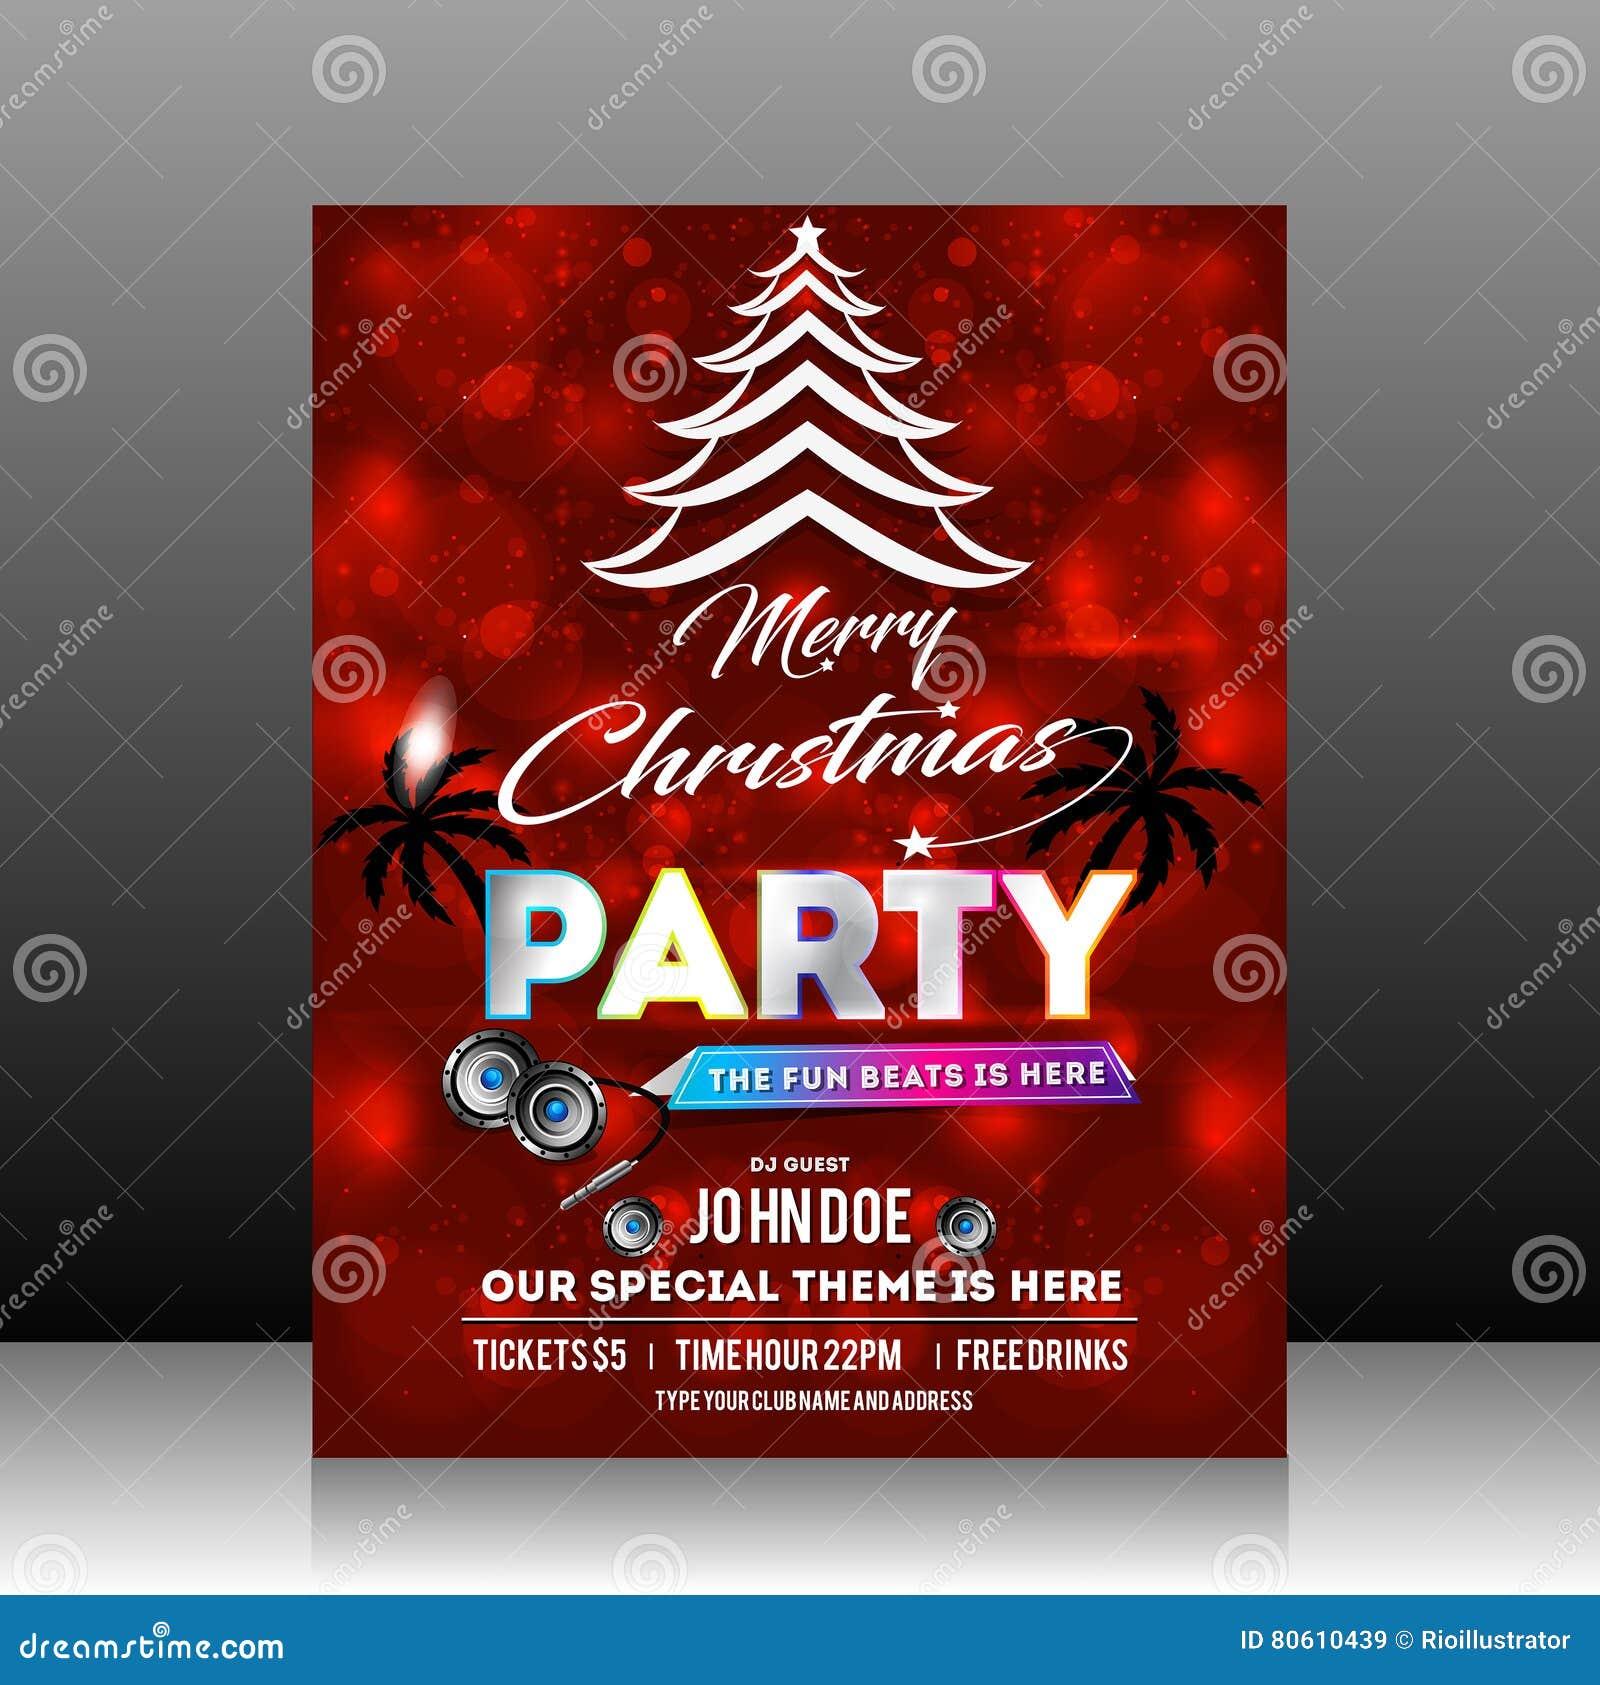 christmas party flyer design stock vector image  christmas party flyer design